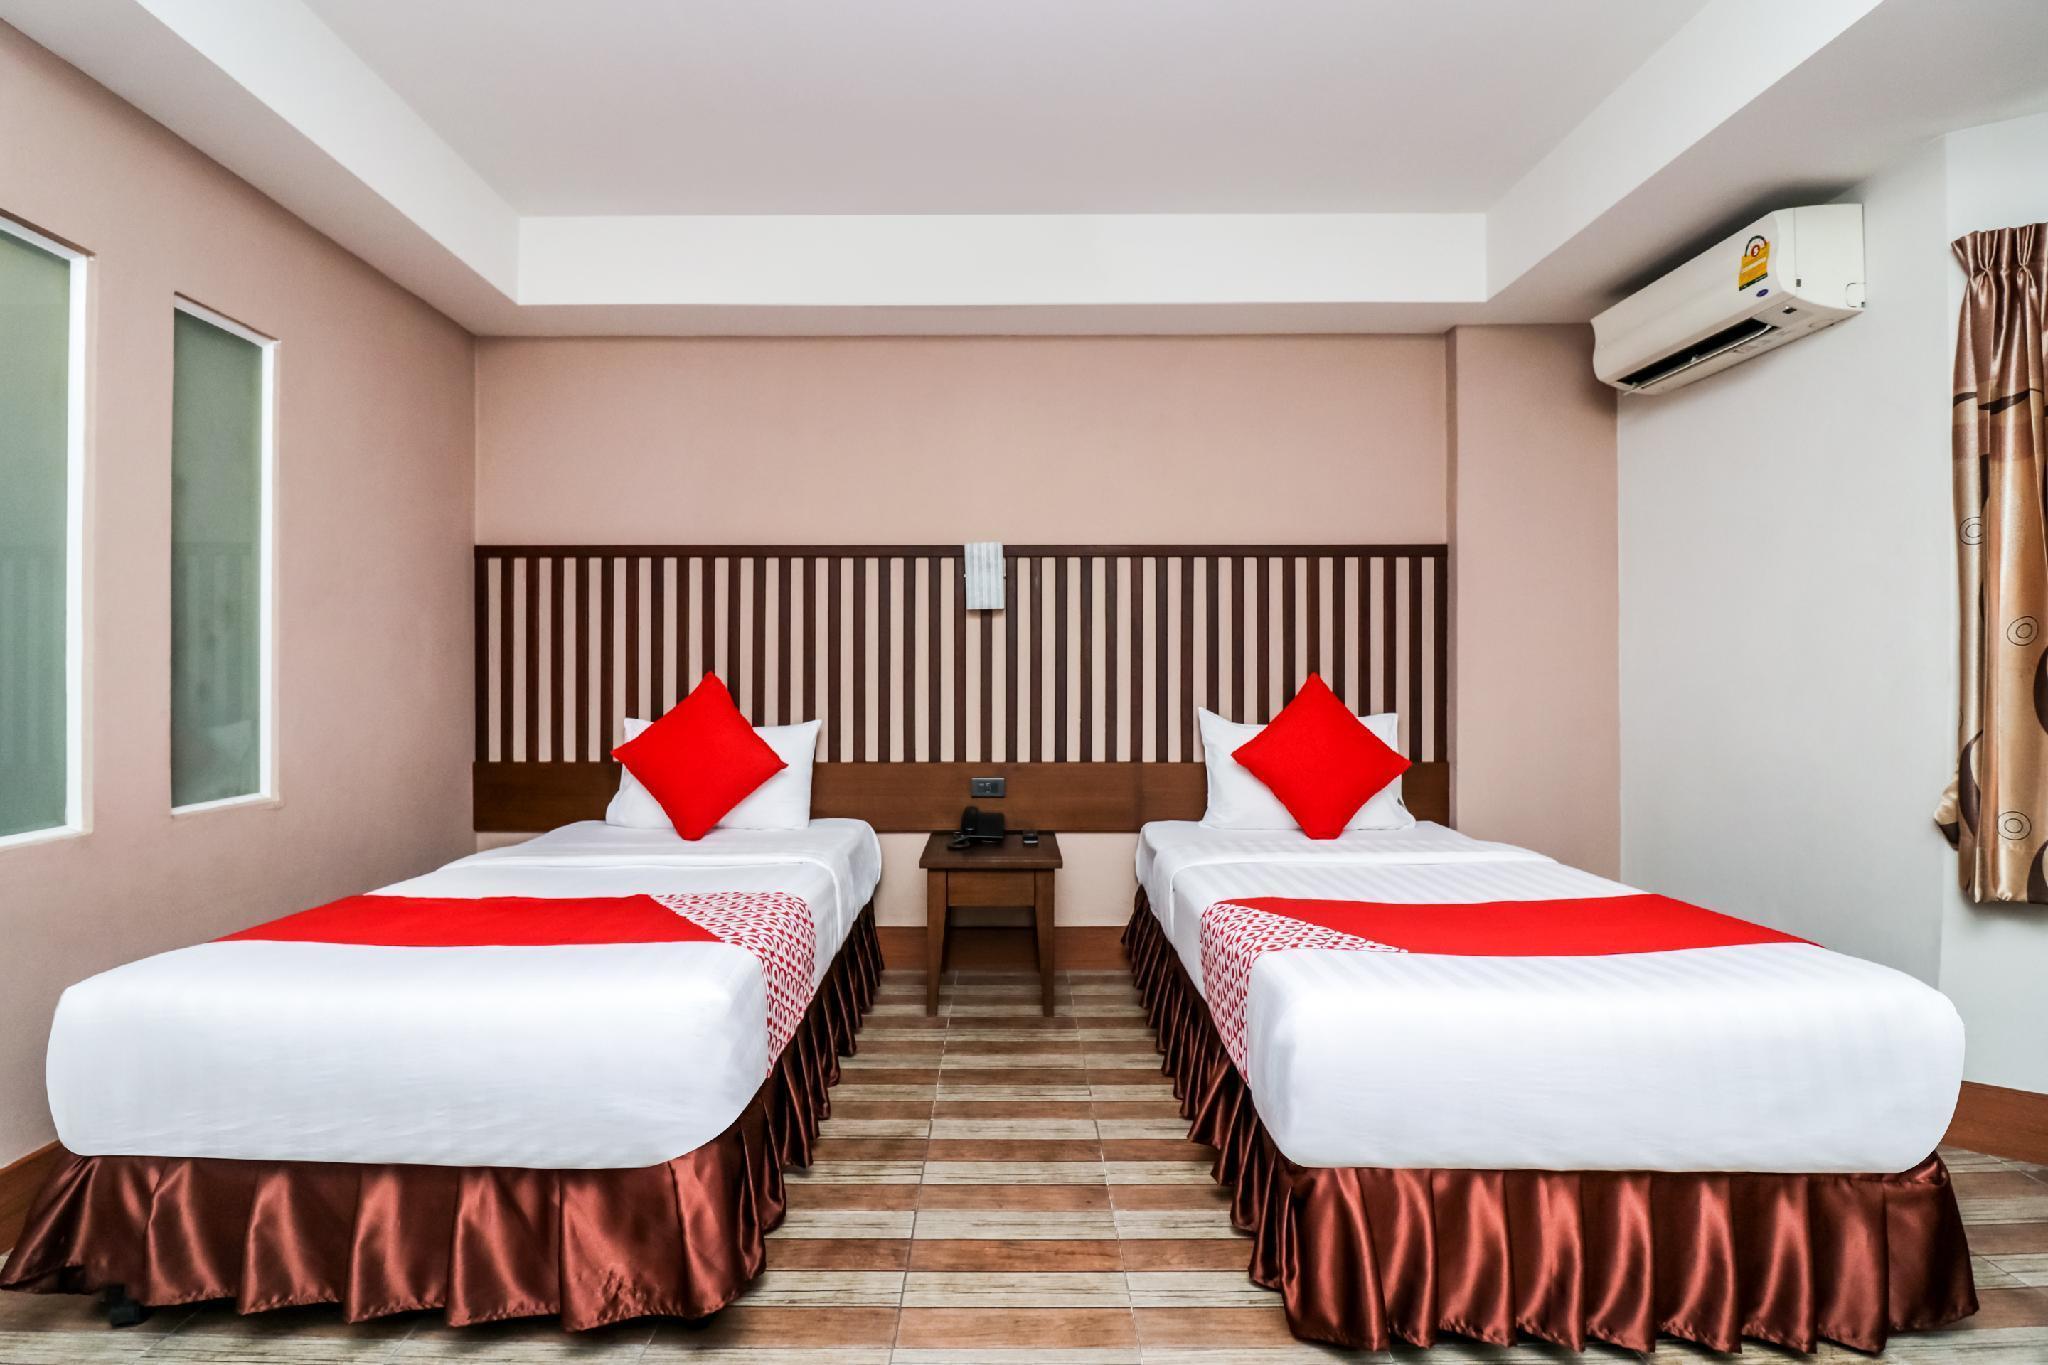 OYO 120 JA Siam City Hotel โอโย 120 JA สยาม ซิตี้ โฮเต็ล